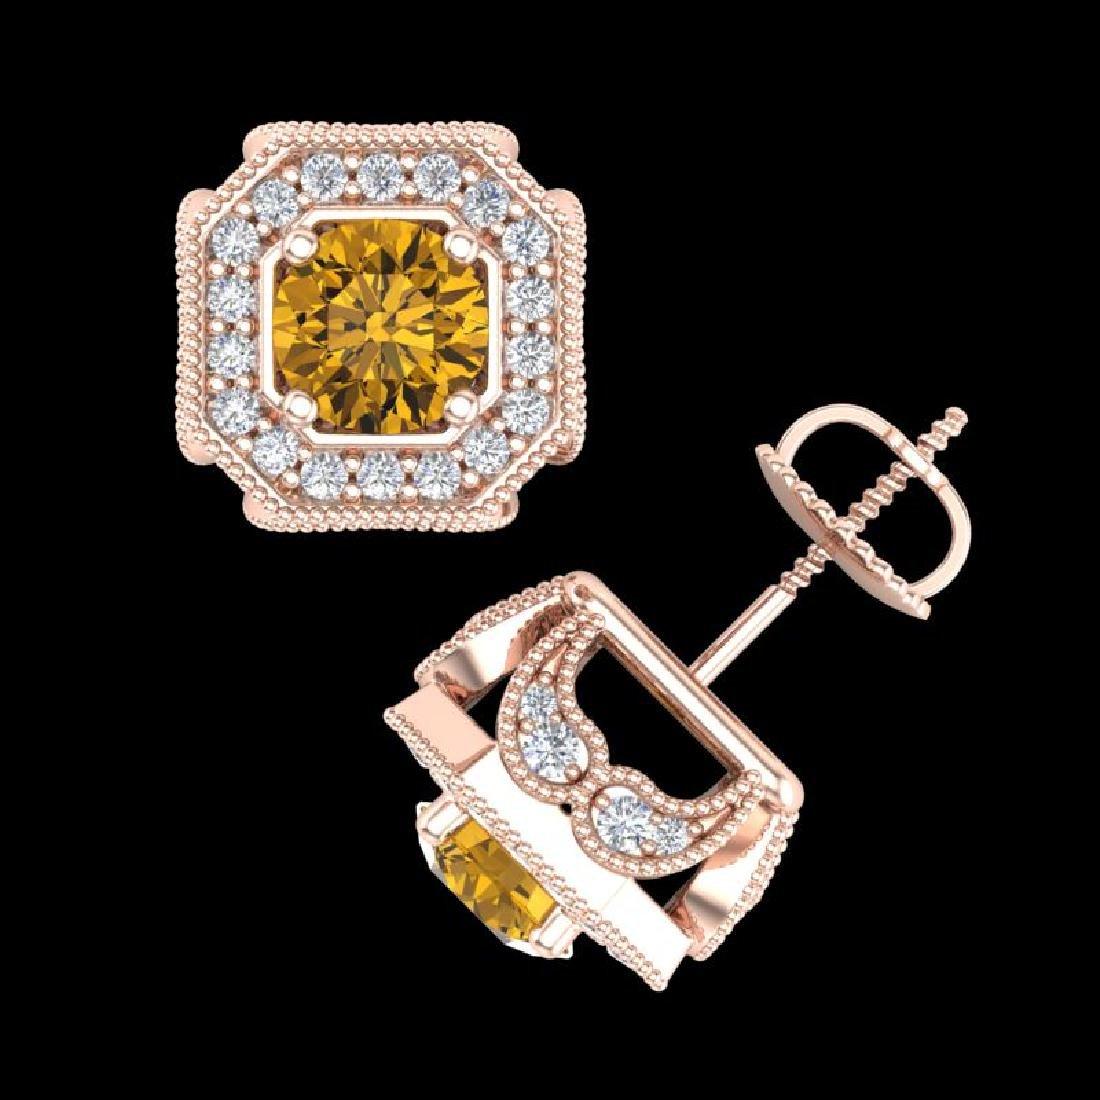 2.75 CTW Intense Fancy Yellow Diamond Art Deco Stud - 3